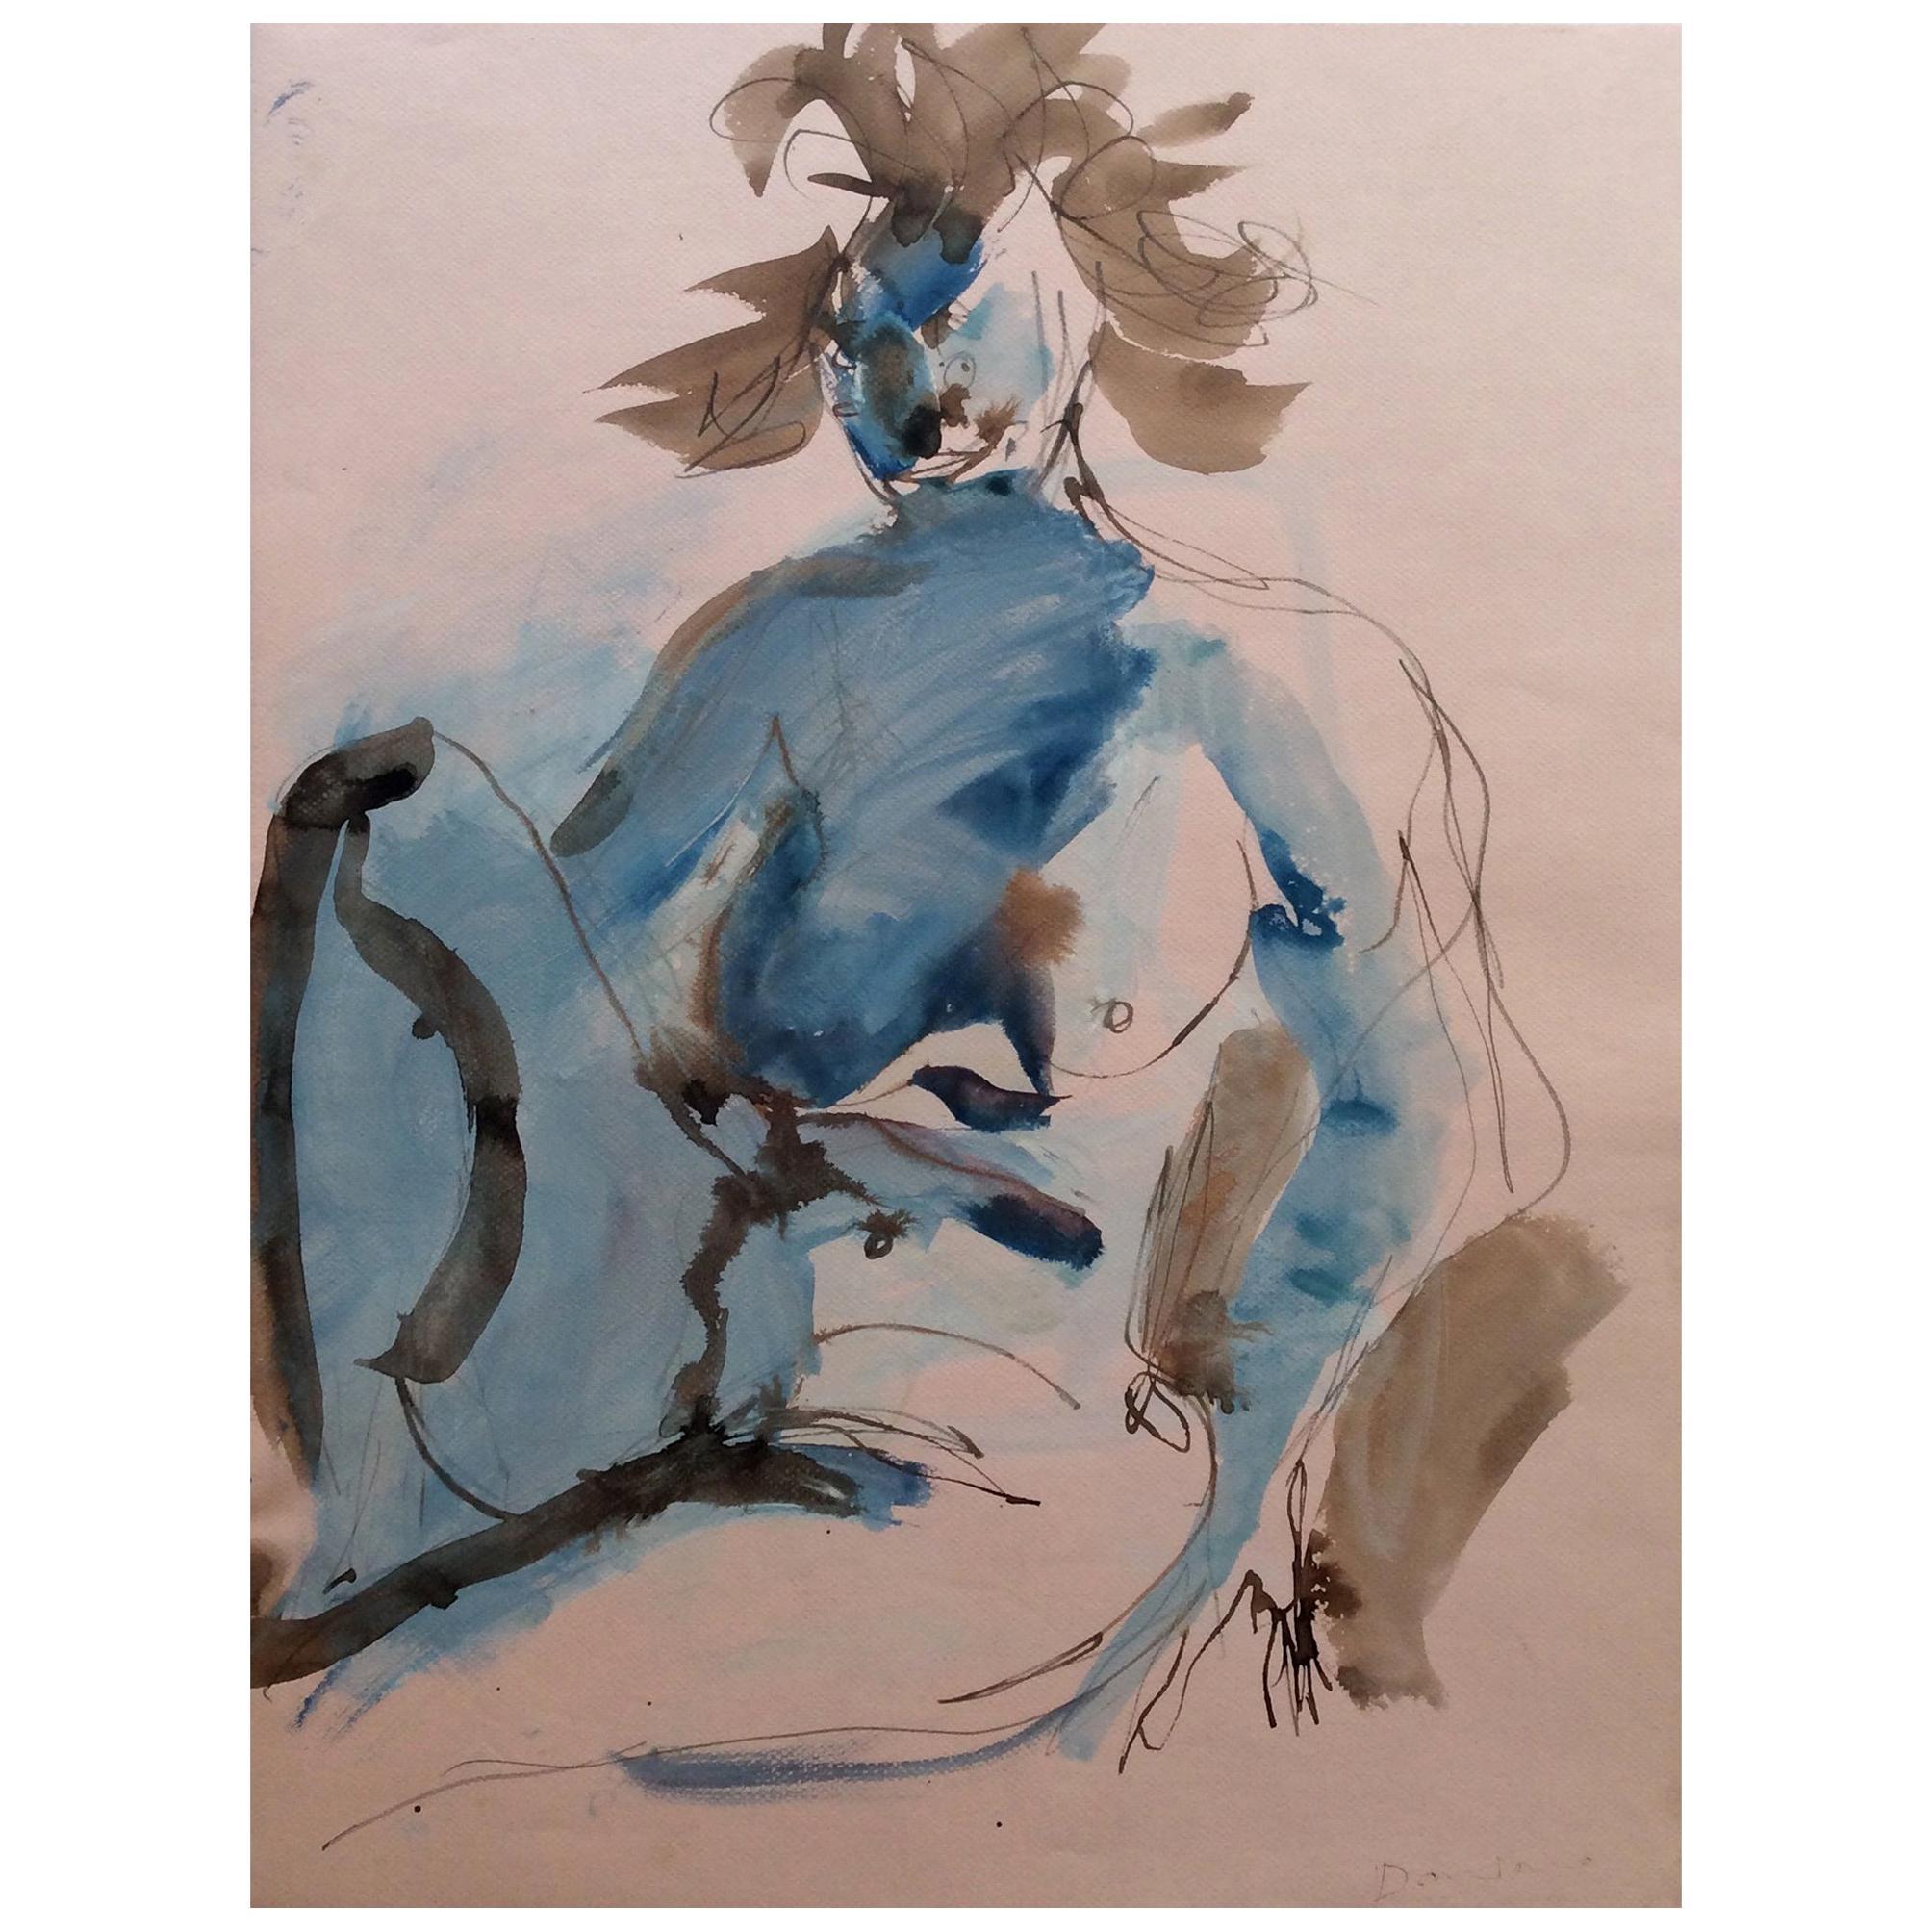 Original Contemporary Figurative Painting by Bernard Damiano